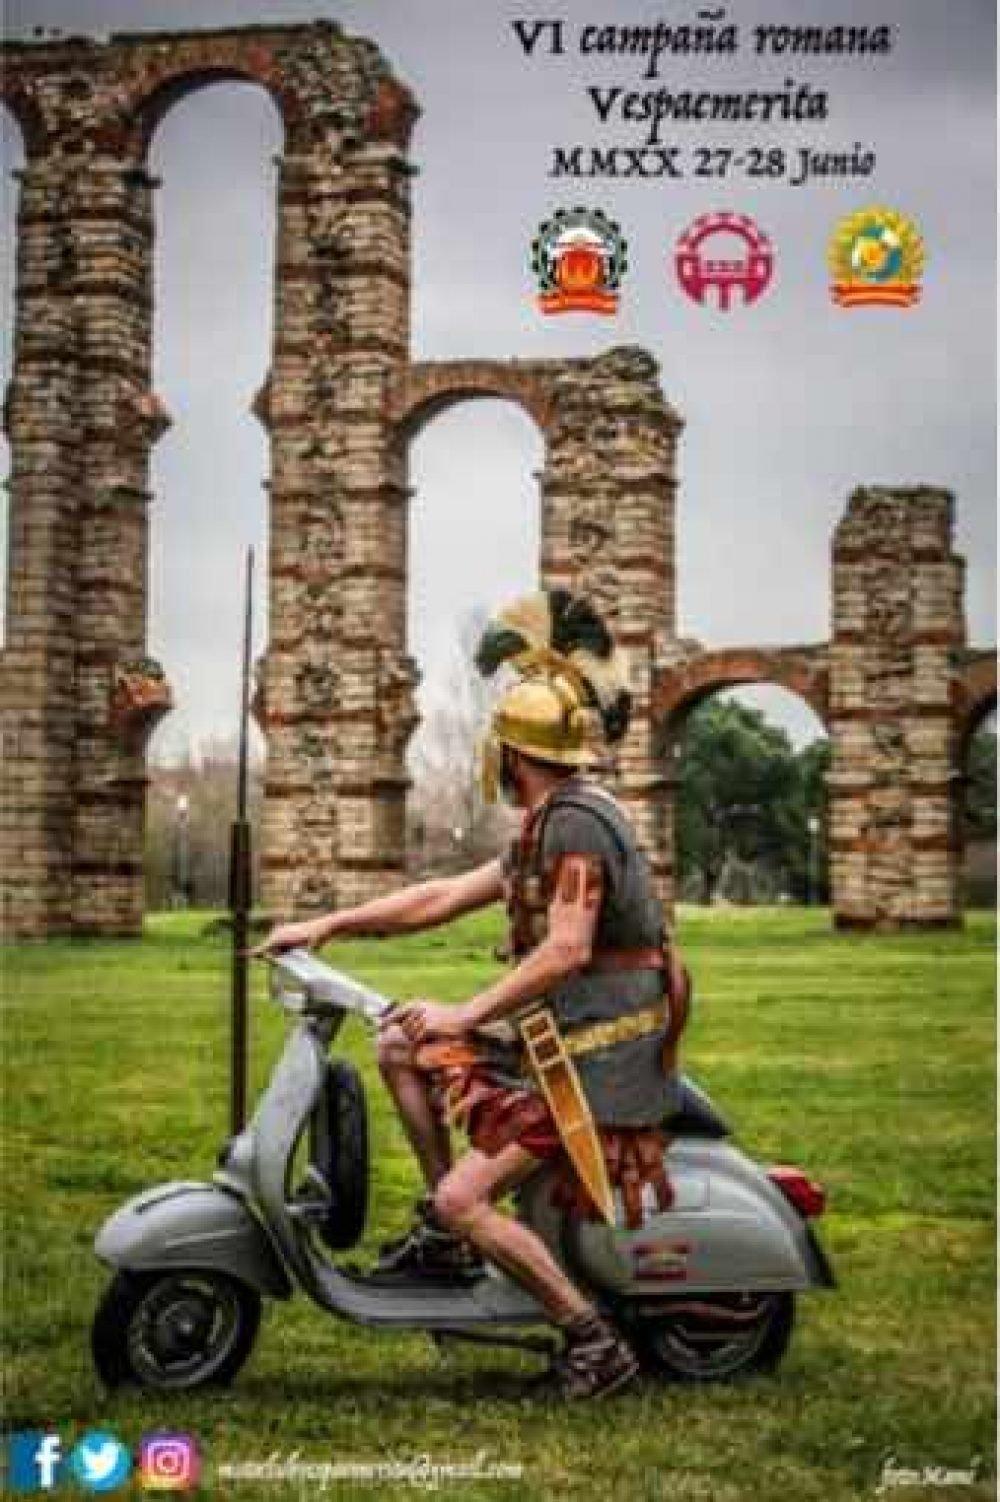 VI Campaña romana. Vespaemerita 2020